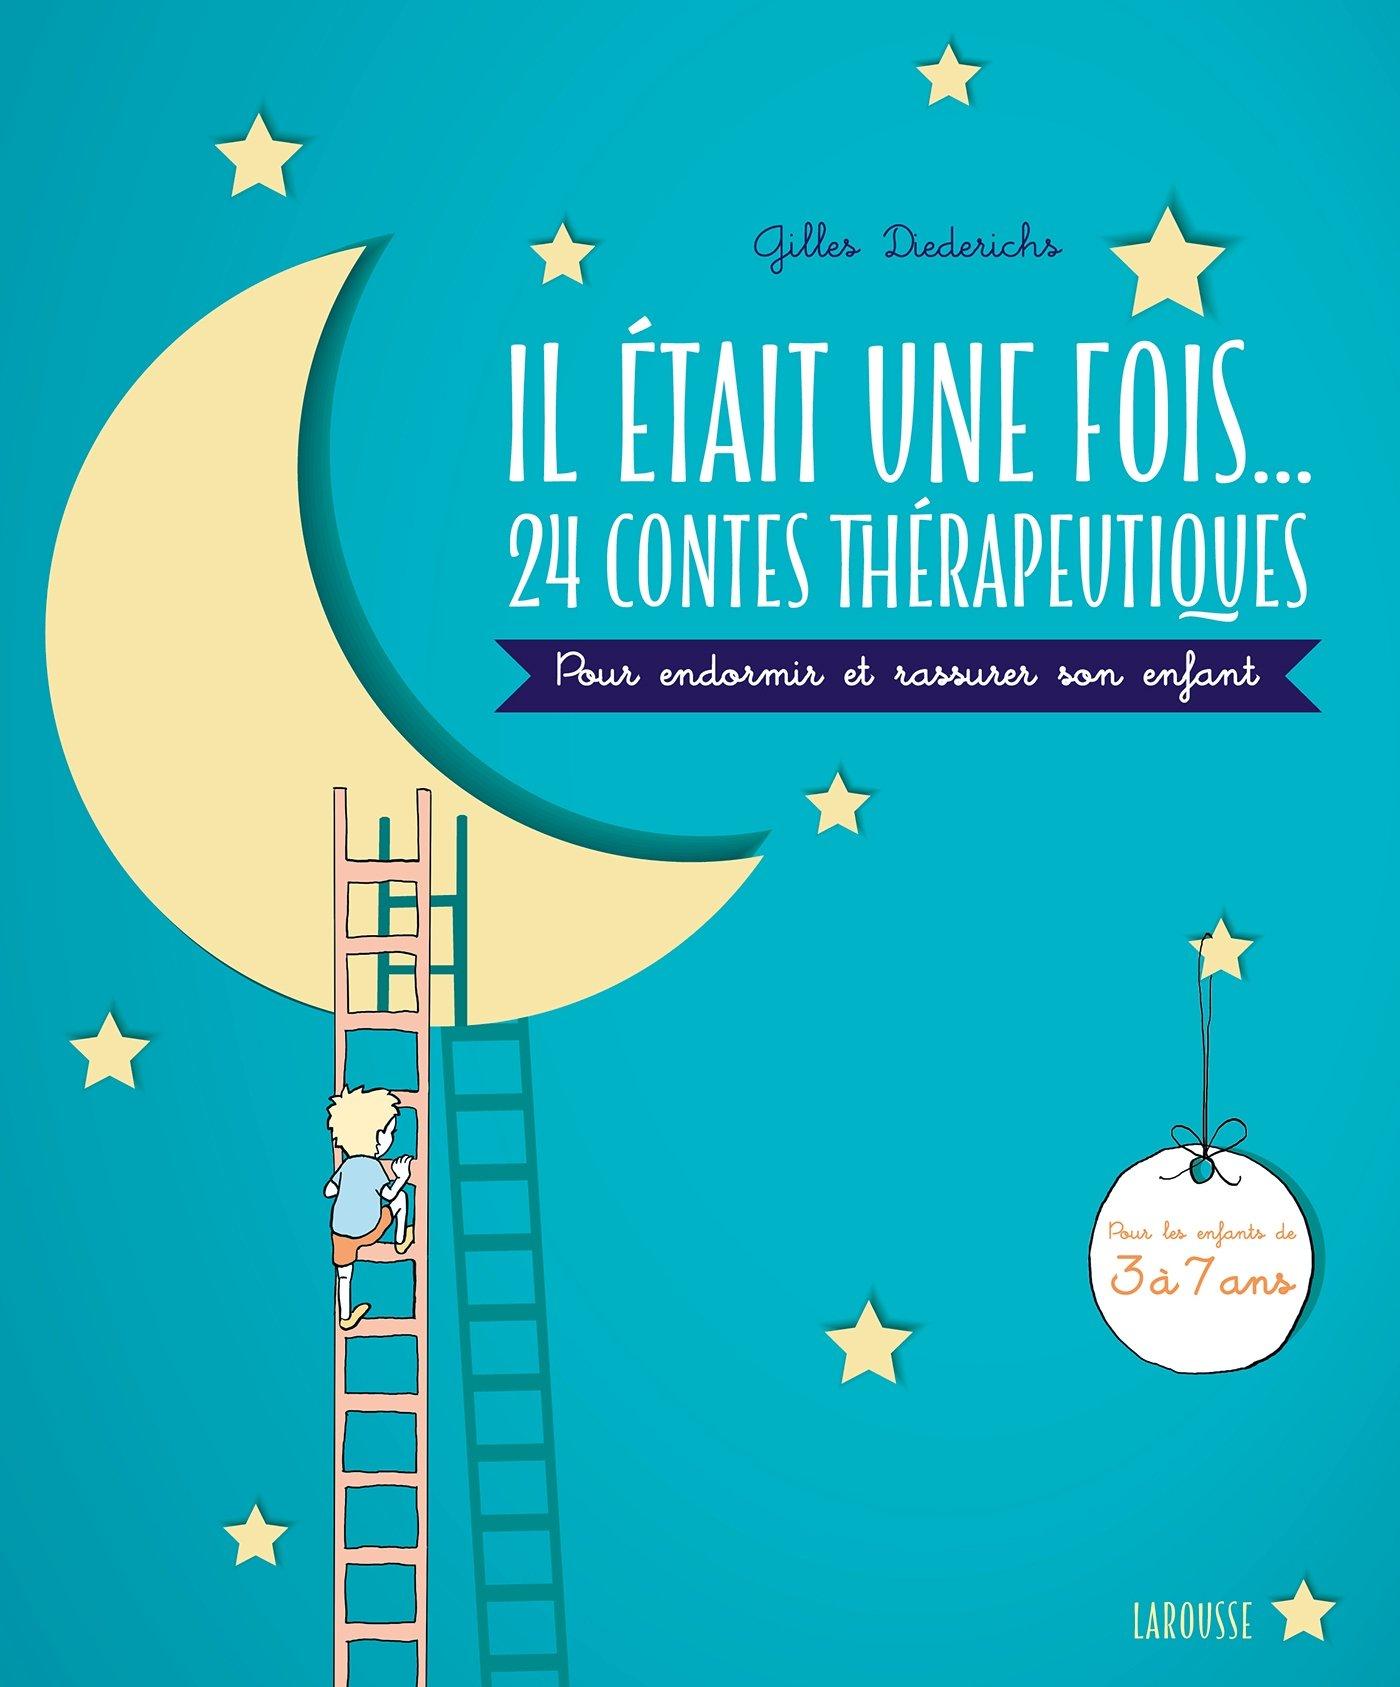 contes thérapeutiques endormir enfants